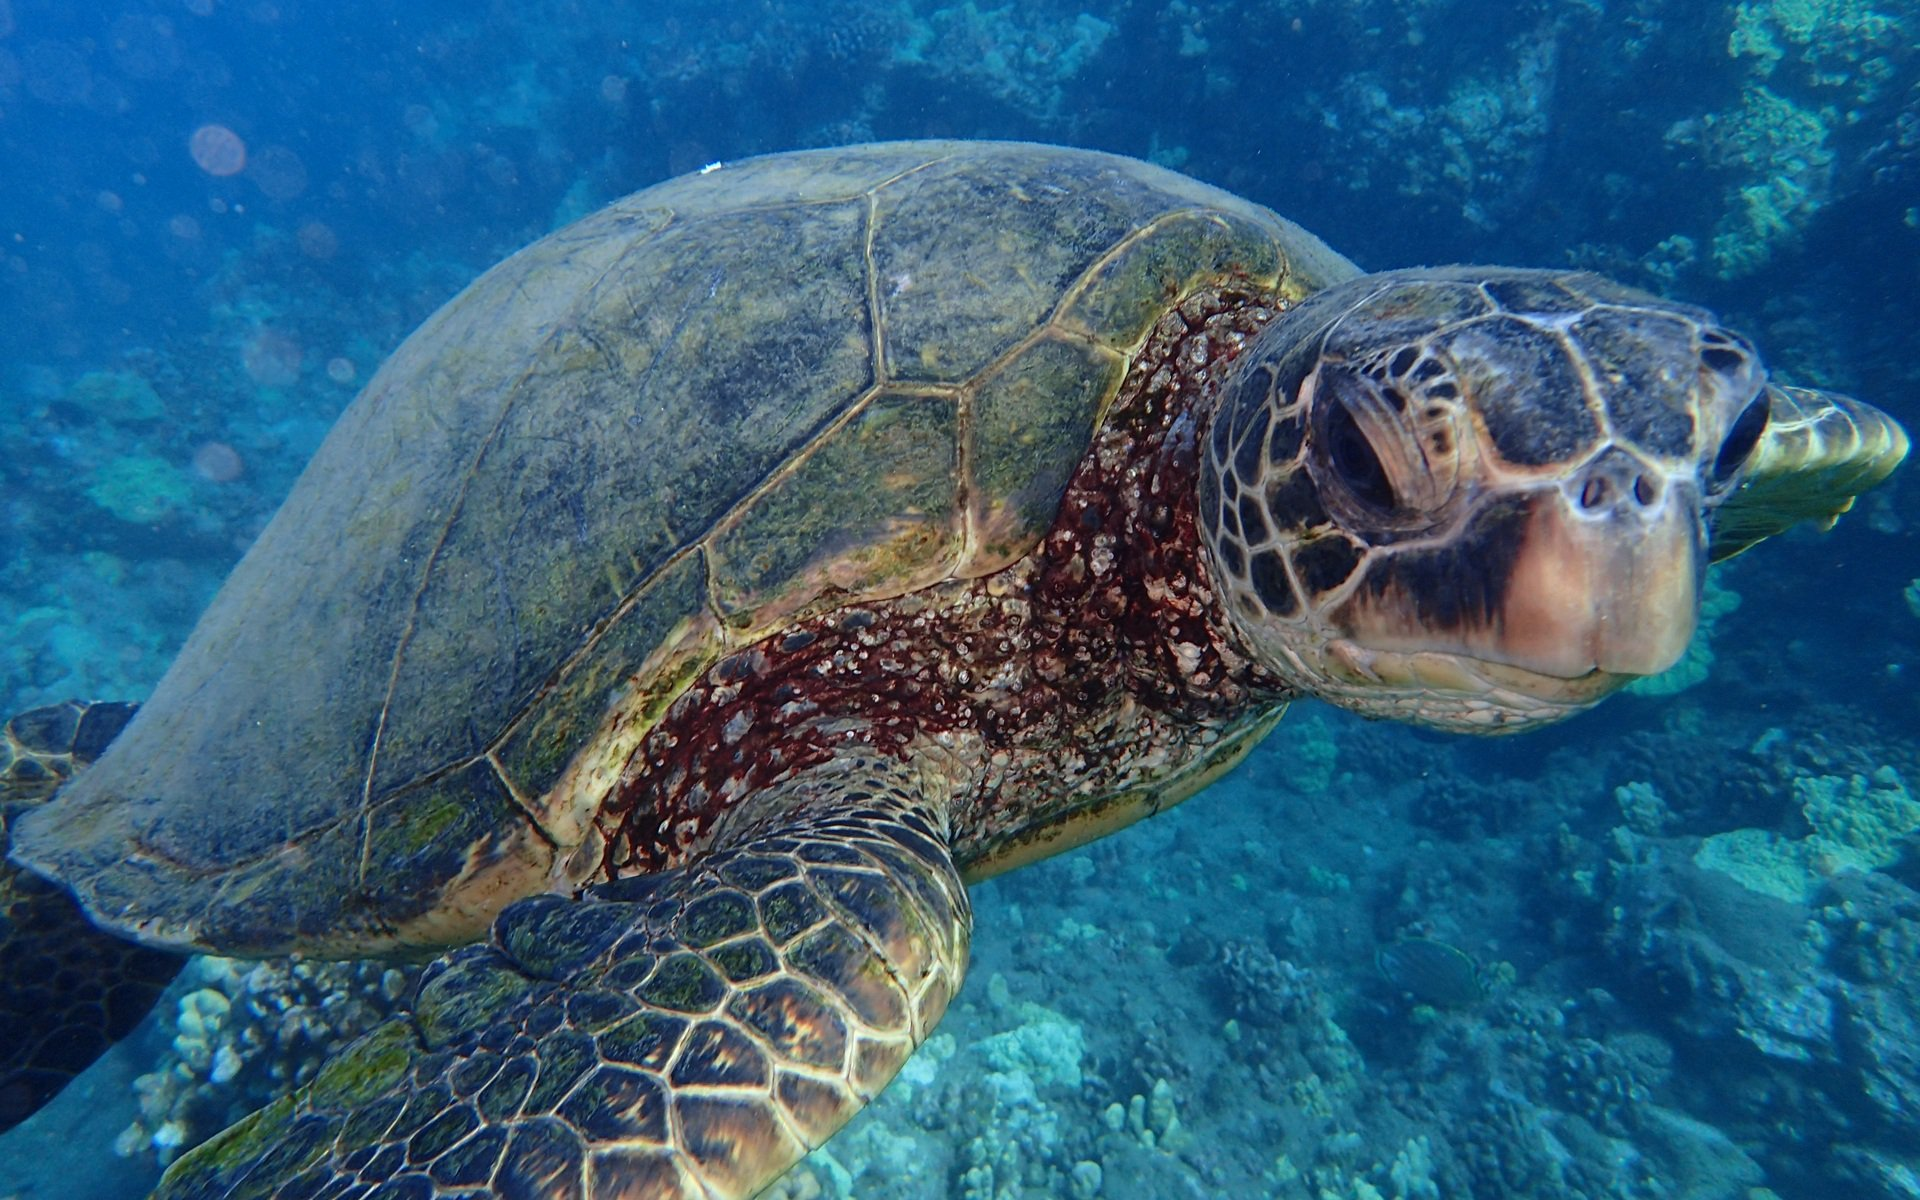 maui sea turtles hawaiian green sea turtles aka honu